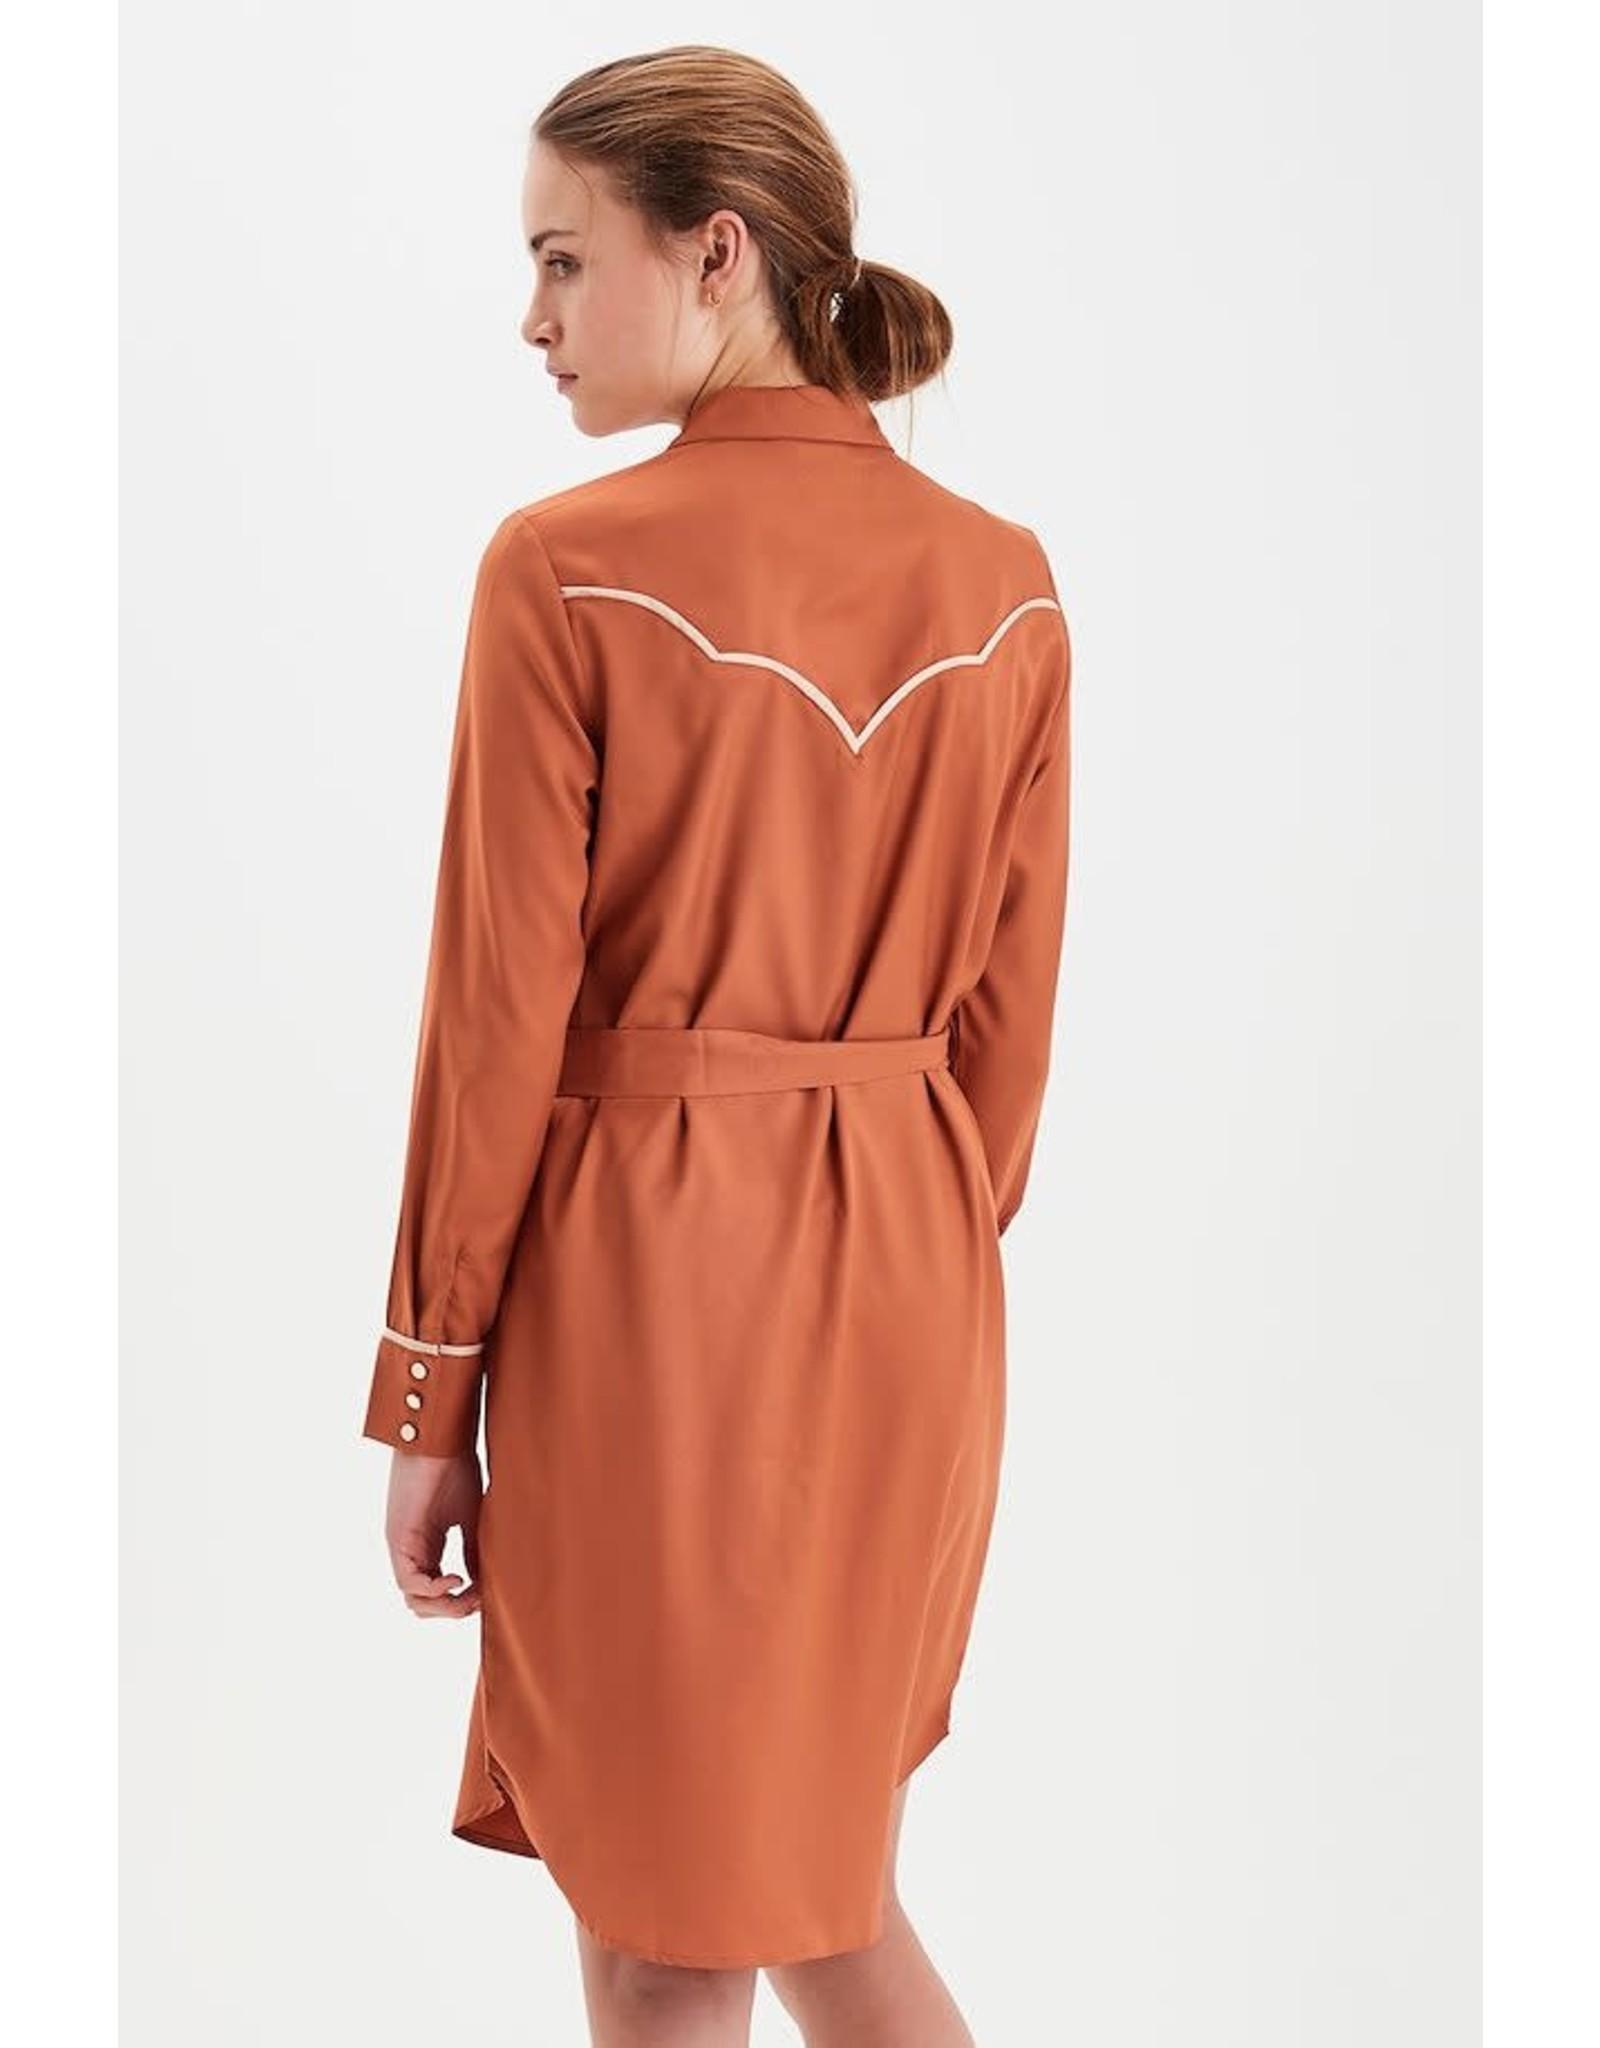 ICHI ICHI - Willa dress (gingerbread)